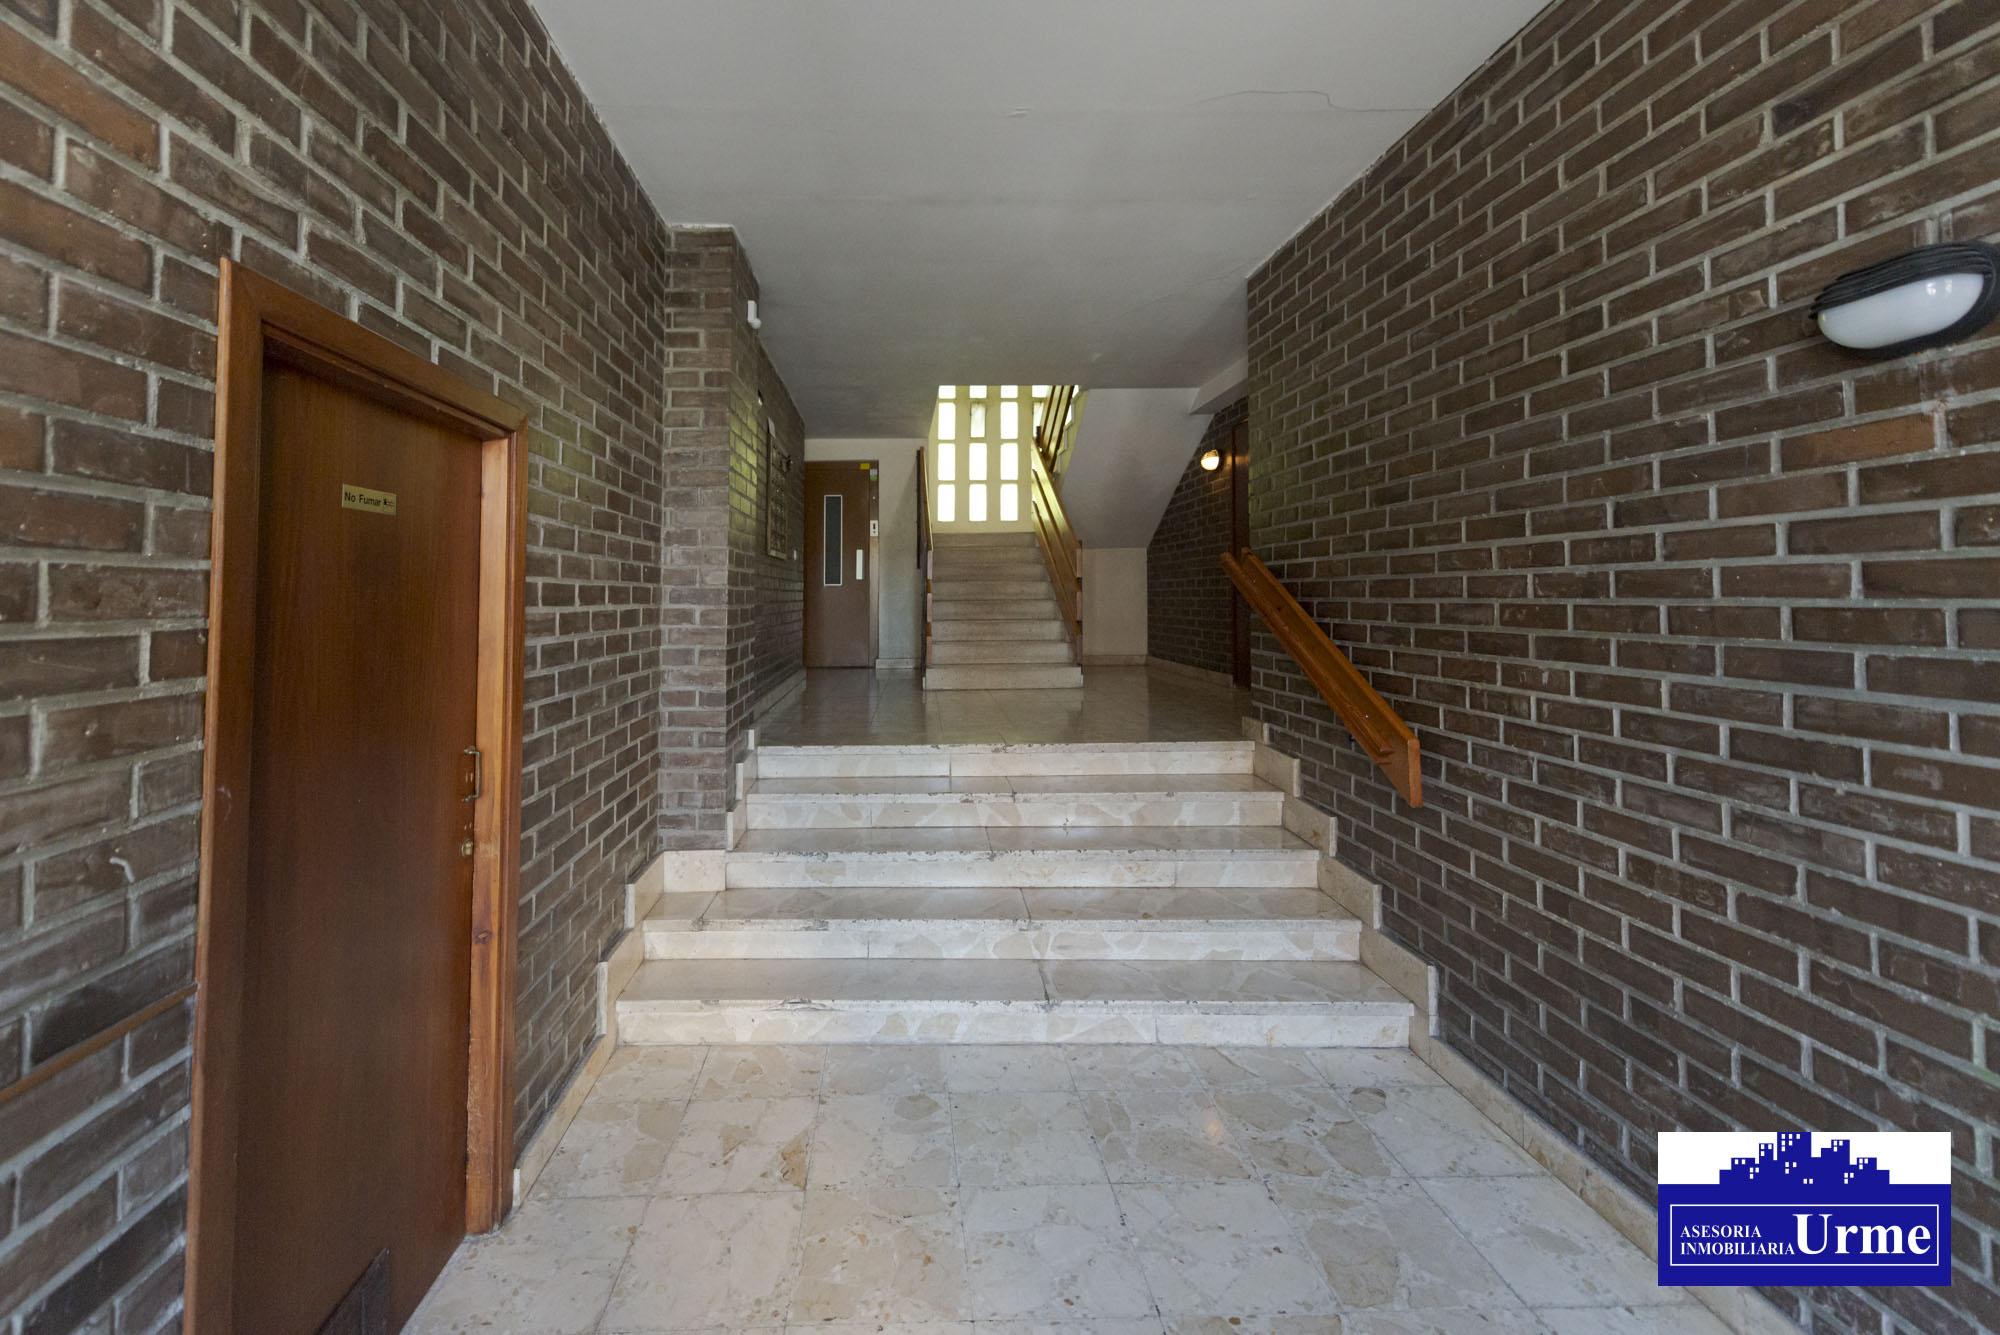 Zona tranquila de Artia, vivienda exterior,2 balcones,3 habitaciones, cocina equipada,salon,baño+aseo.Para entrar!!